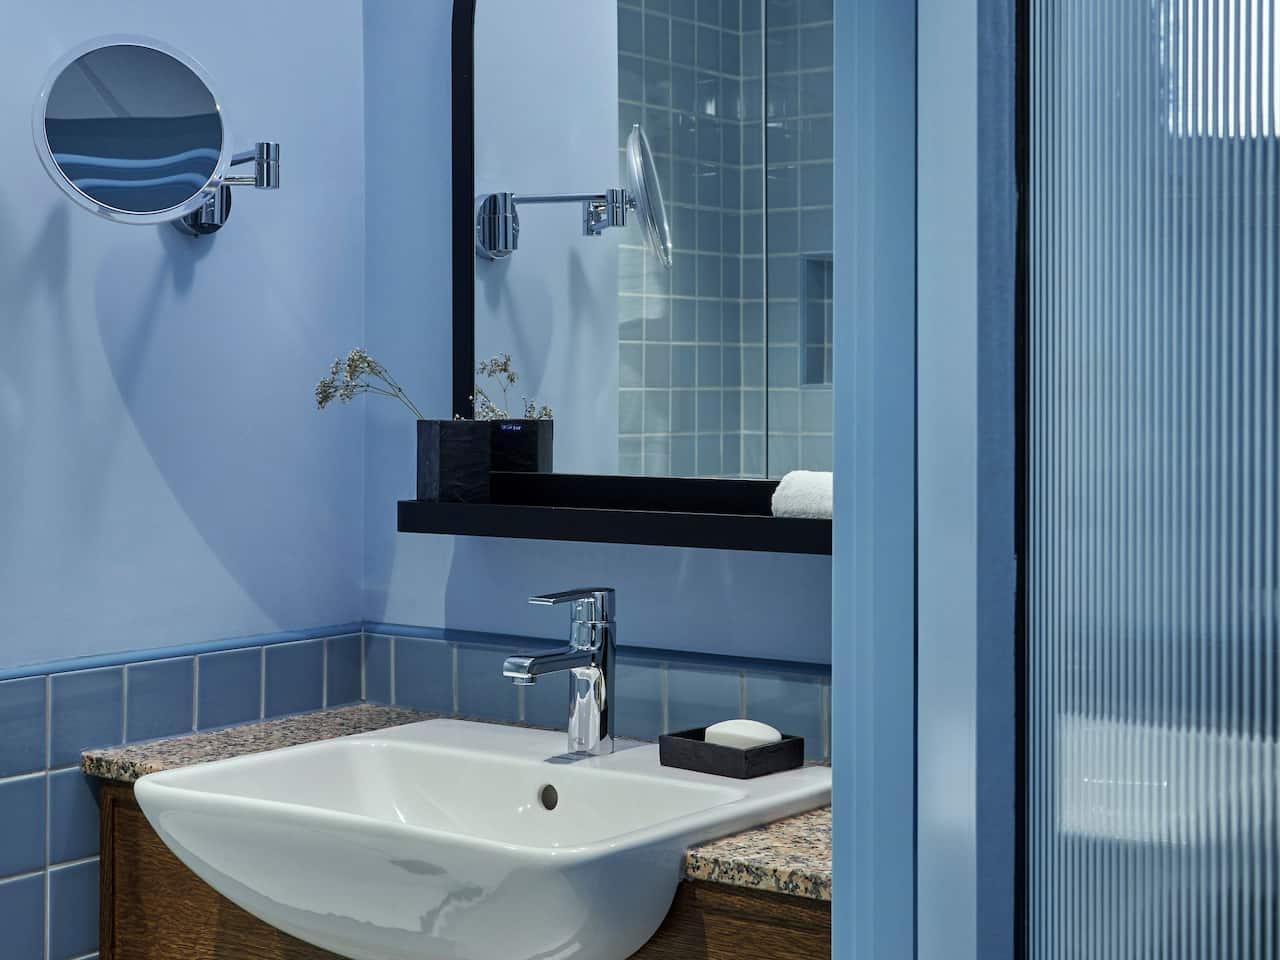 Hyatt Centric Cambridge Bathroom